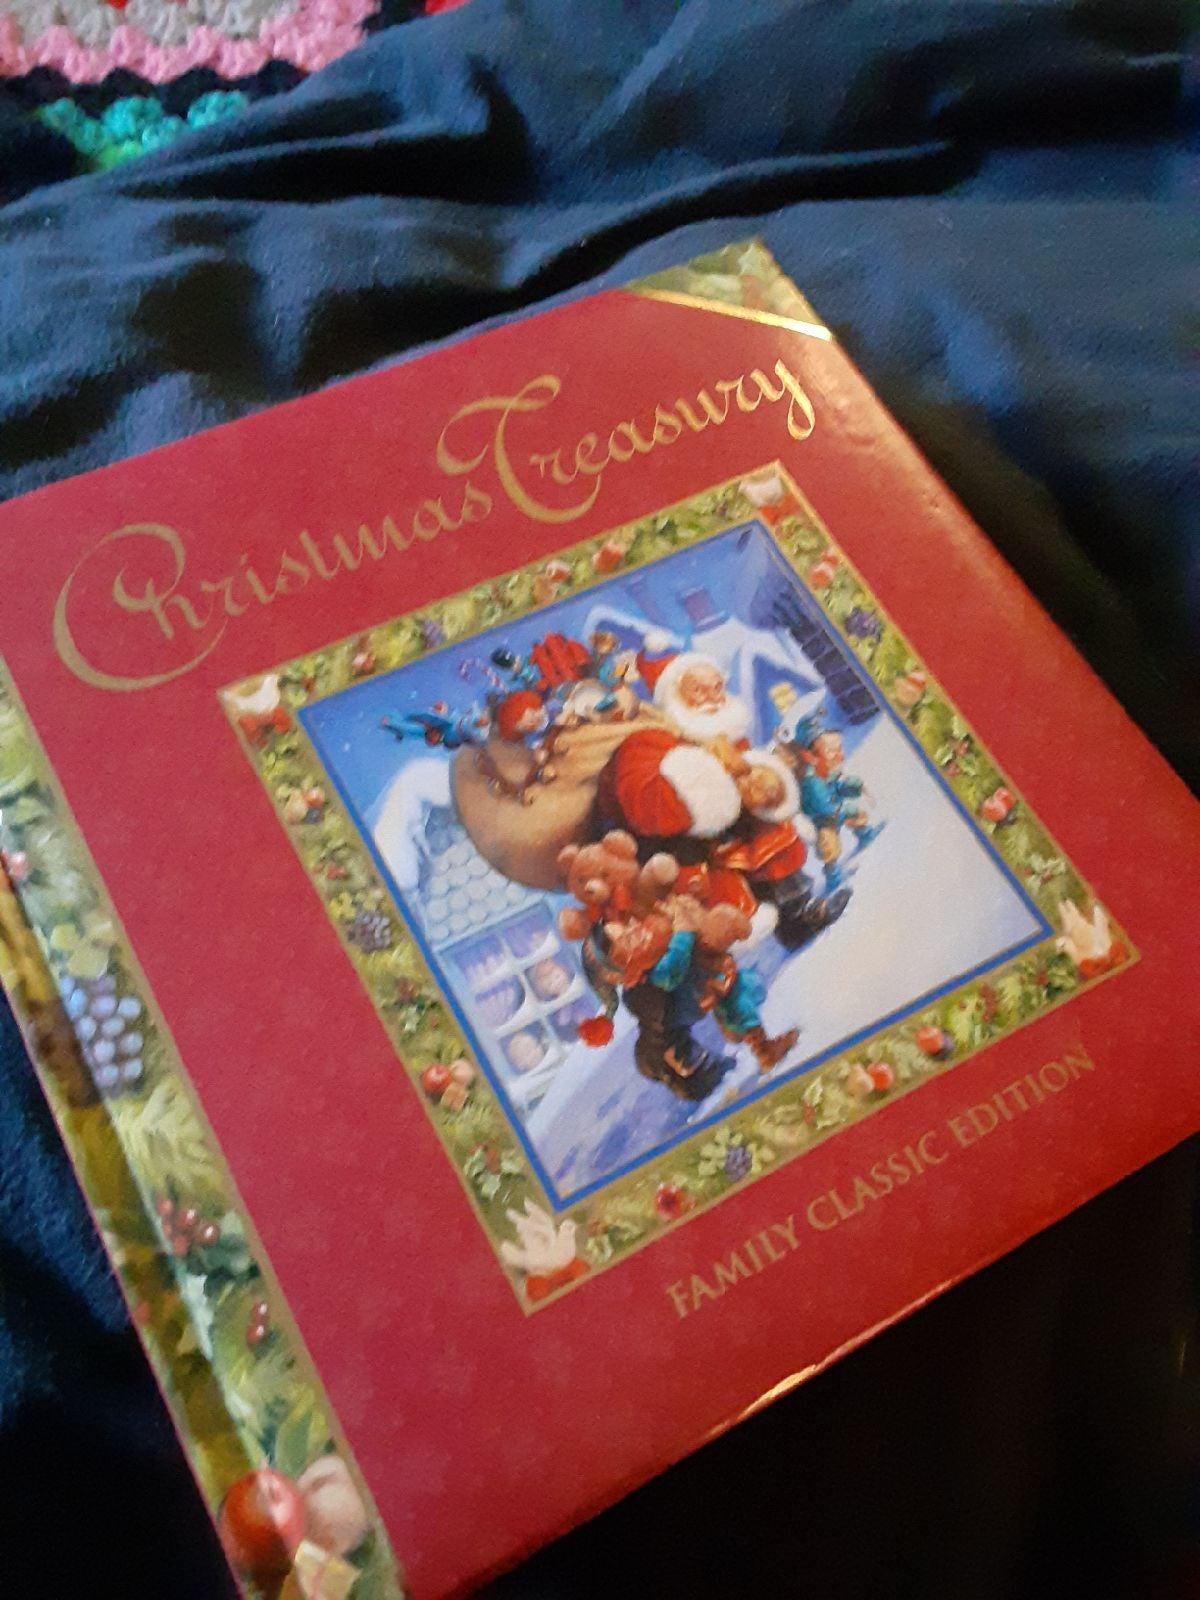 Christmas treasury hardcover book